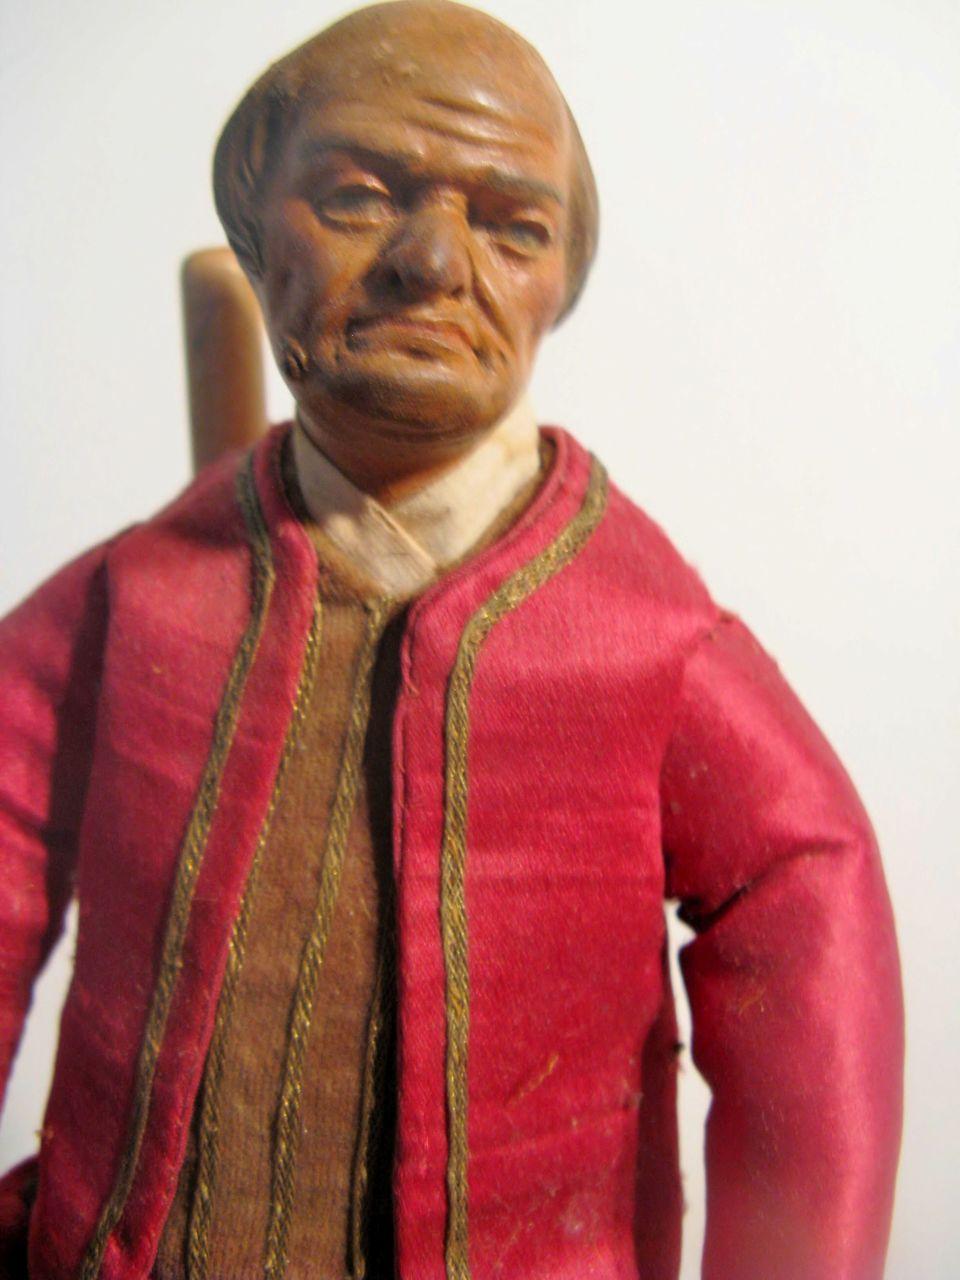 NEAPOLITAN Balded Man Painted Terracotta And Wood CRECHE Figure